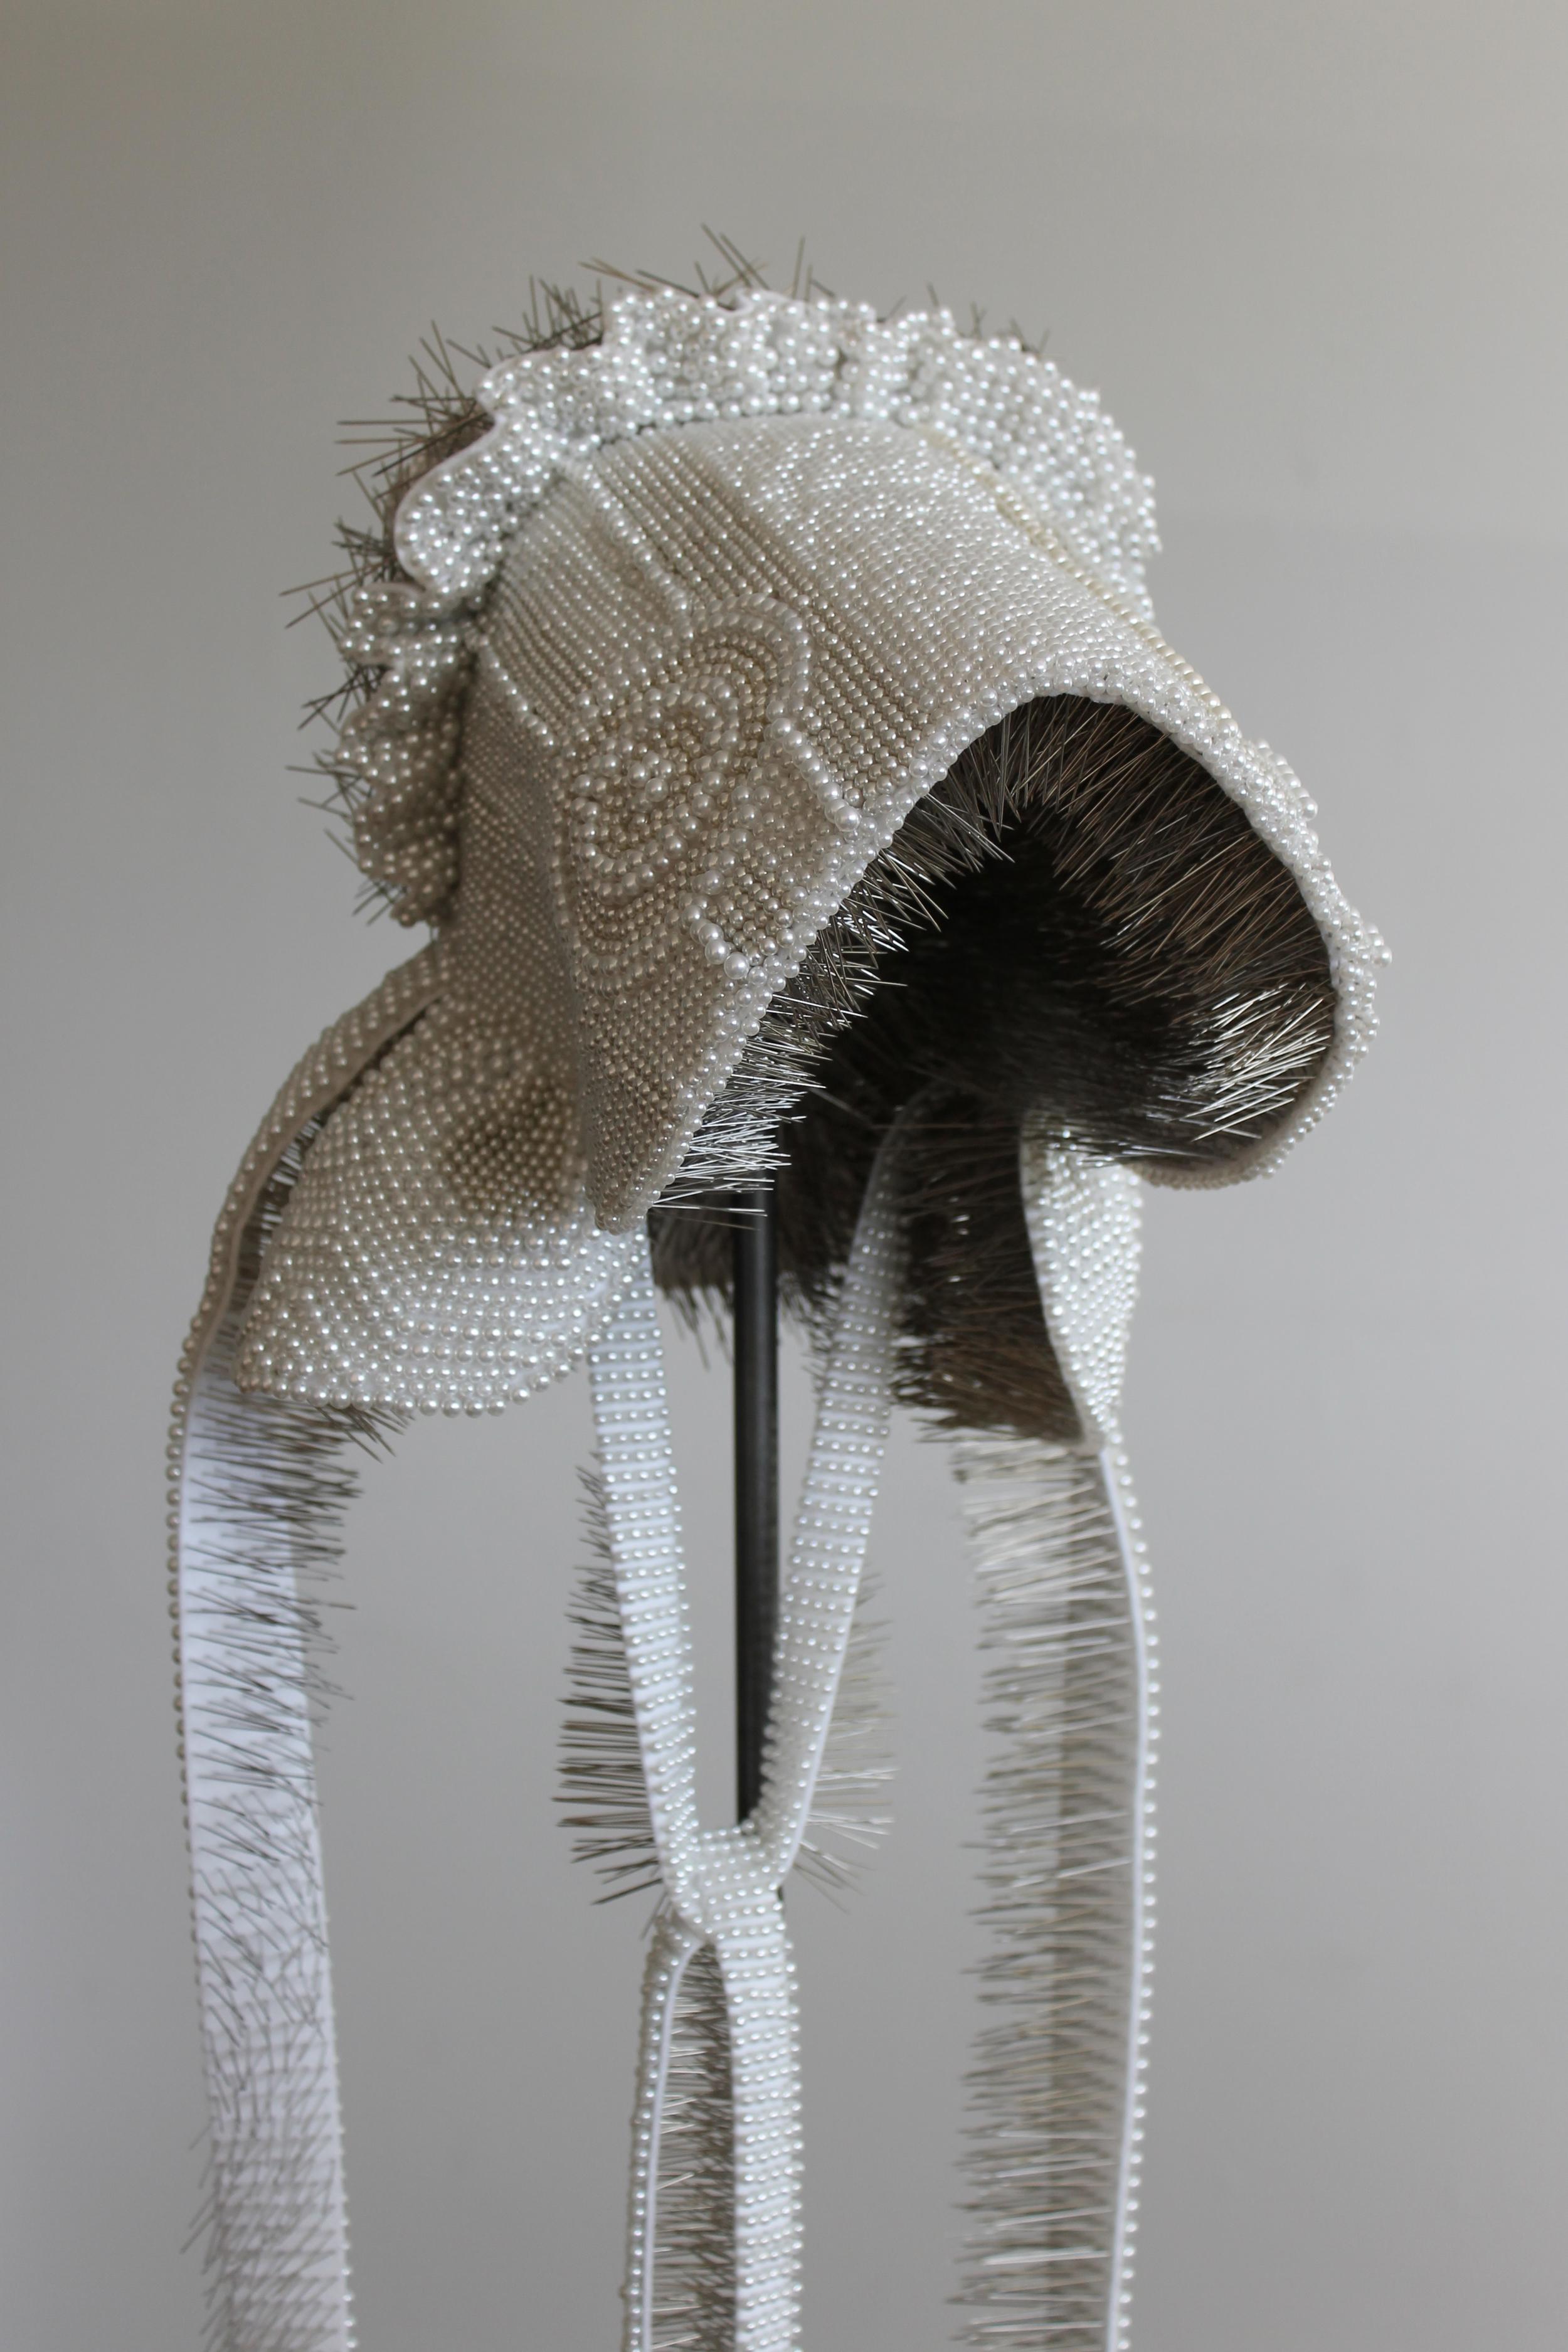 "Seer Bonnet XVII (Martha)  22,921 pearl corsage pins, fabric, steel, wood, 64.5"" x 13"" x 16"", 2011"